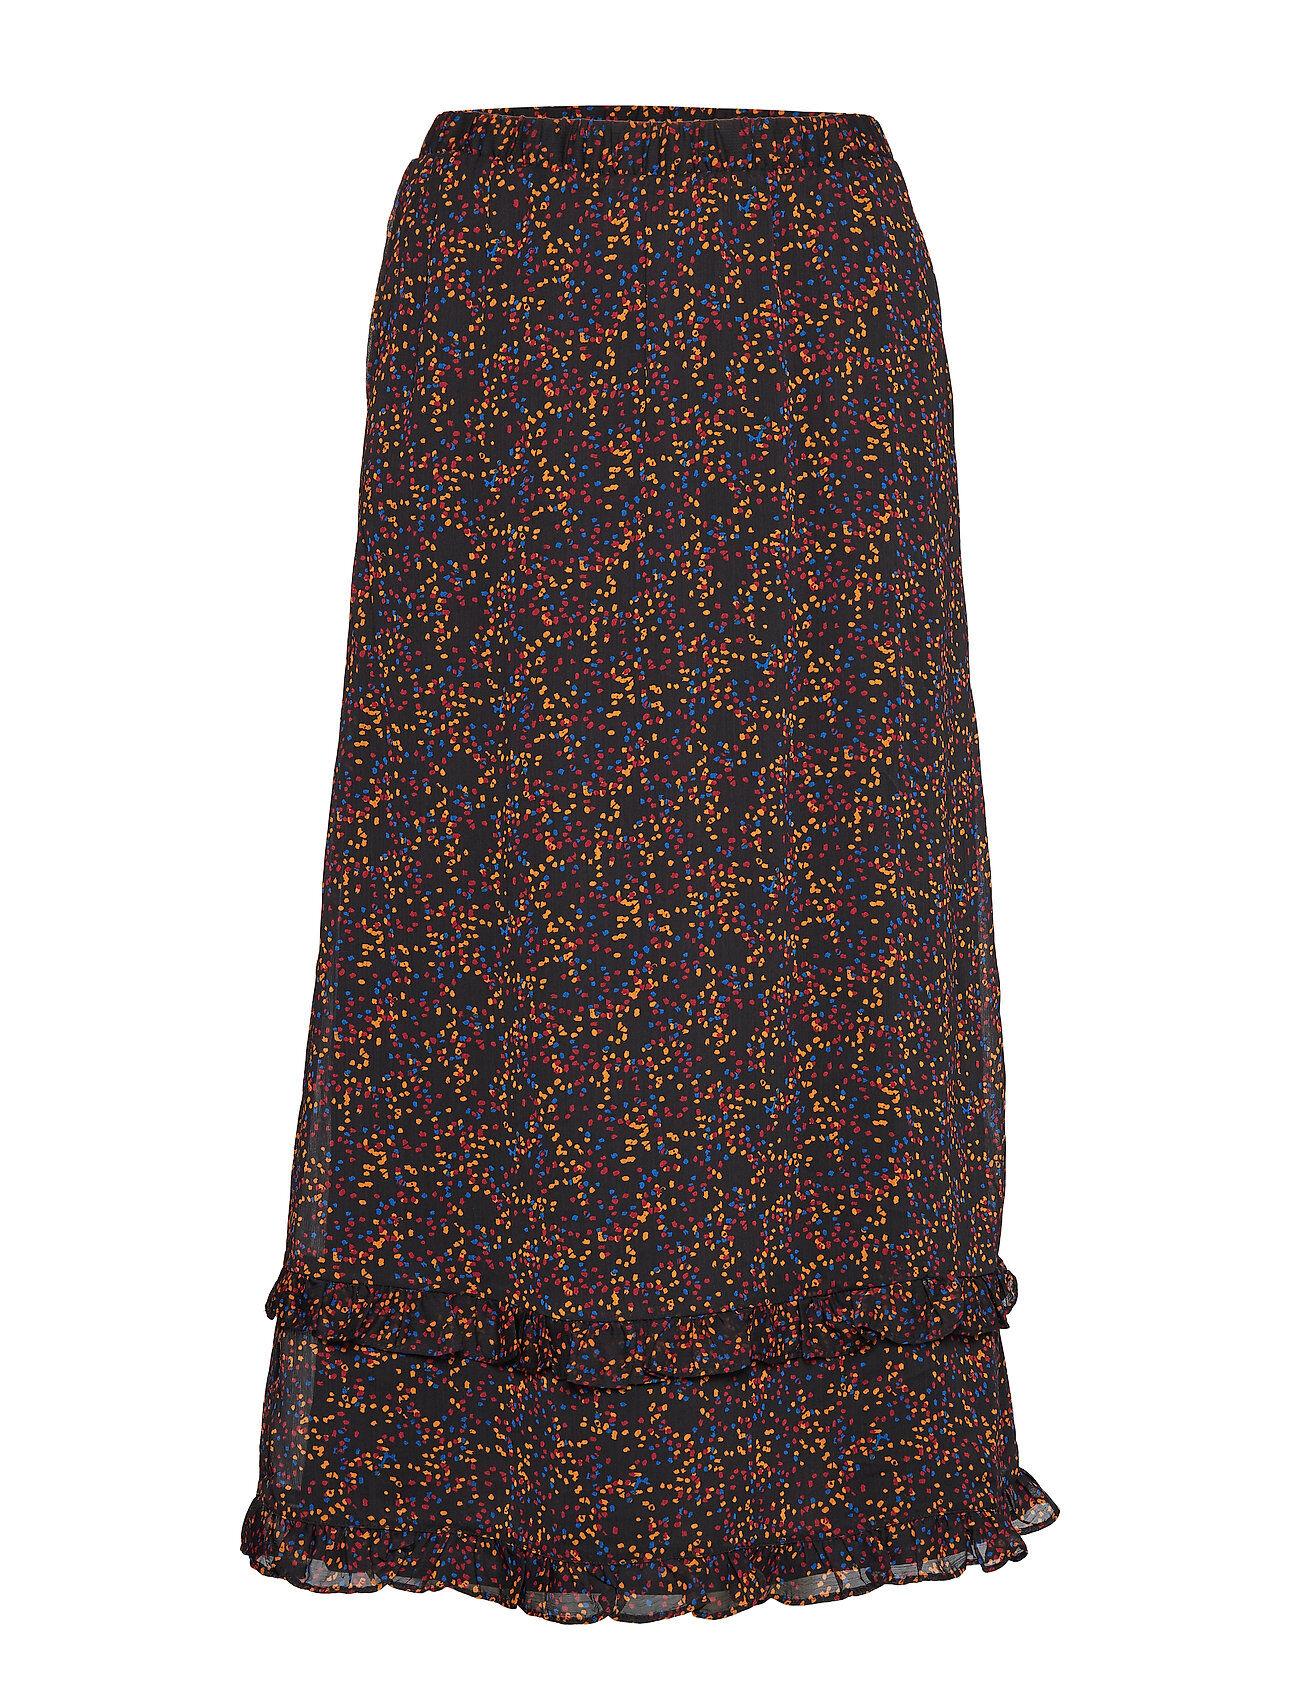 Gestuz Alminagz Skirt Ma19 Polvipituinen Hame Monivärinen/Kuvioitu Gestuz